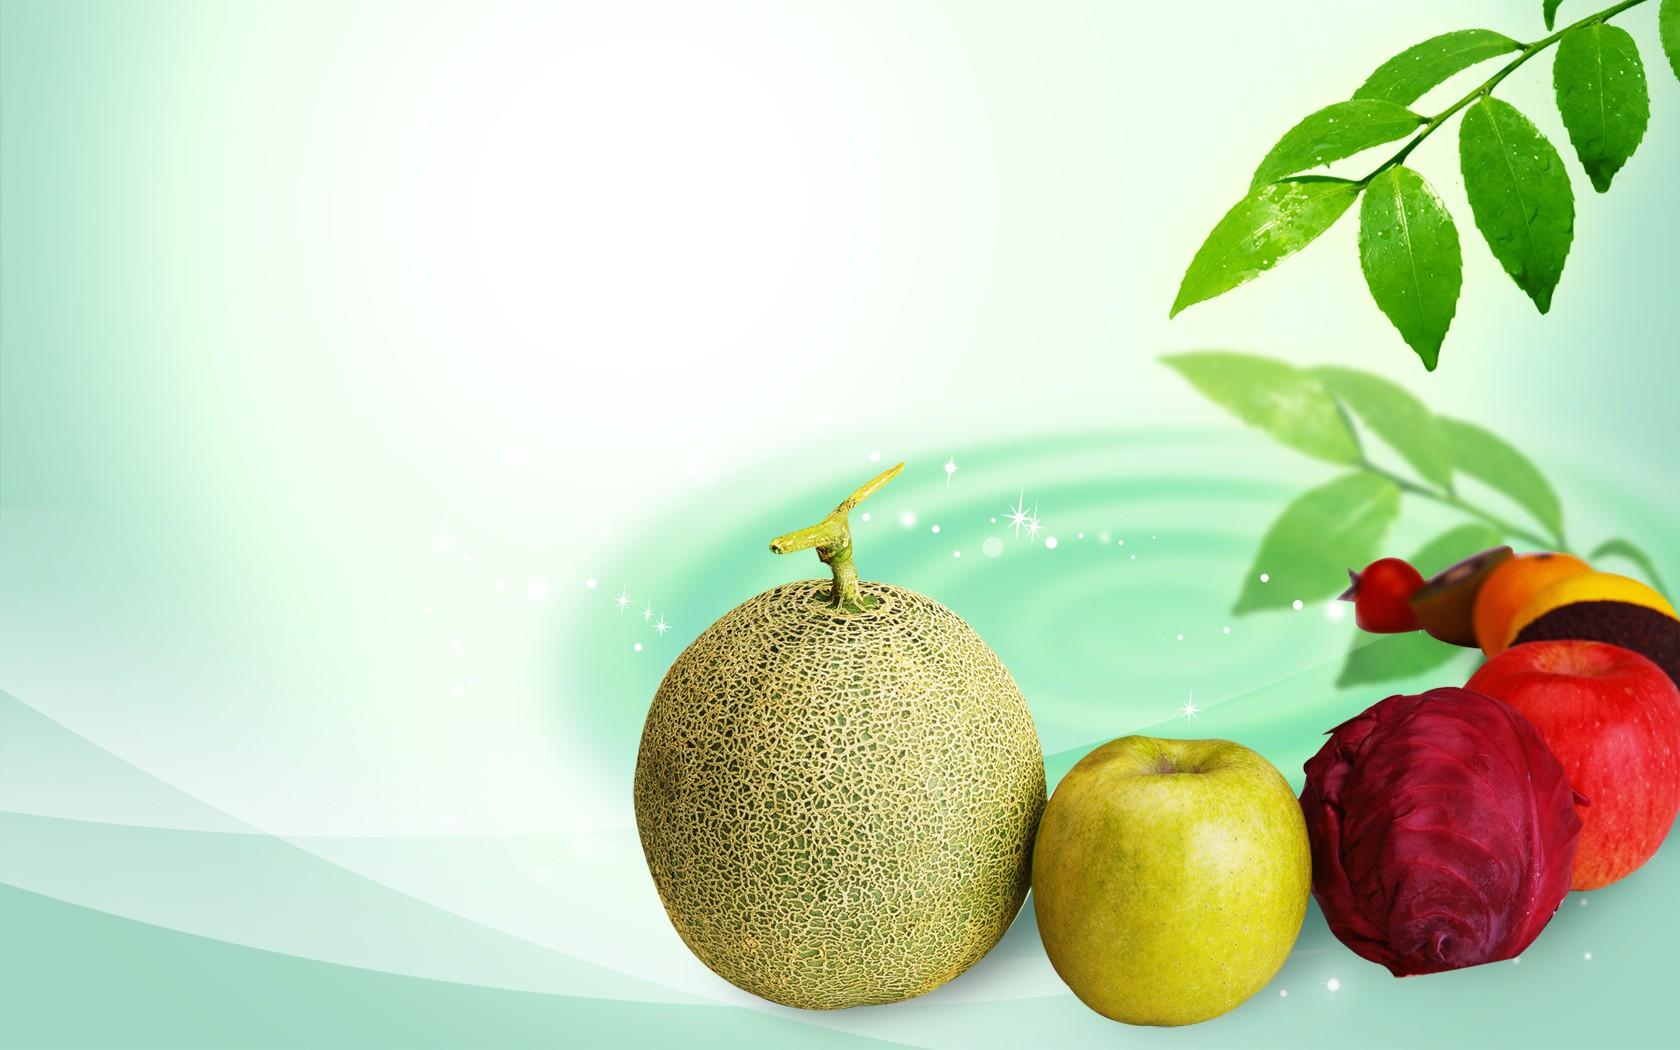 cartoon fruit pics wallpaper desktop cartoon fruits images dowload 1680x1050